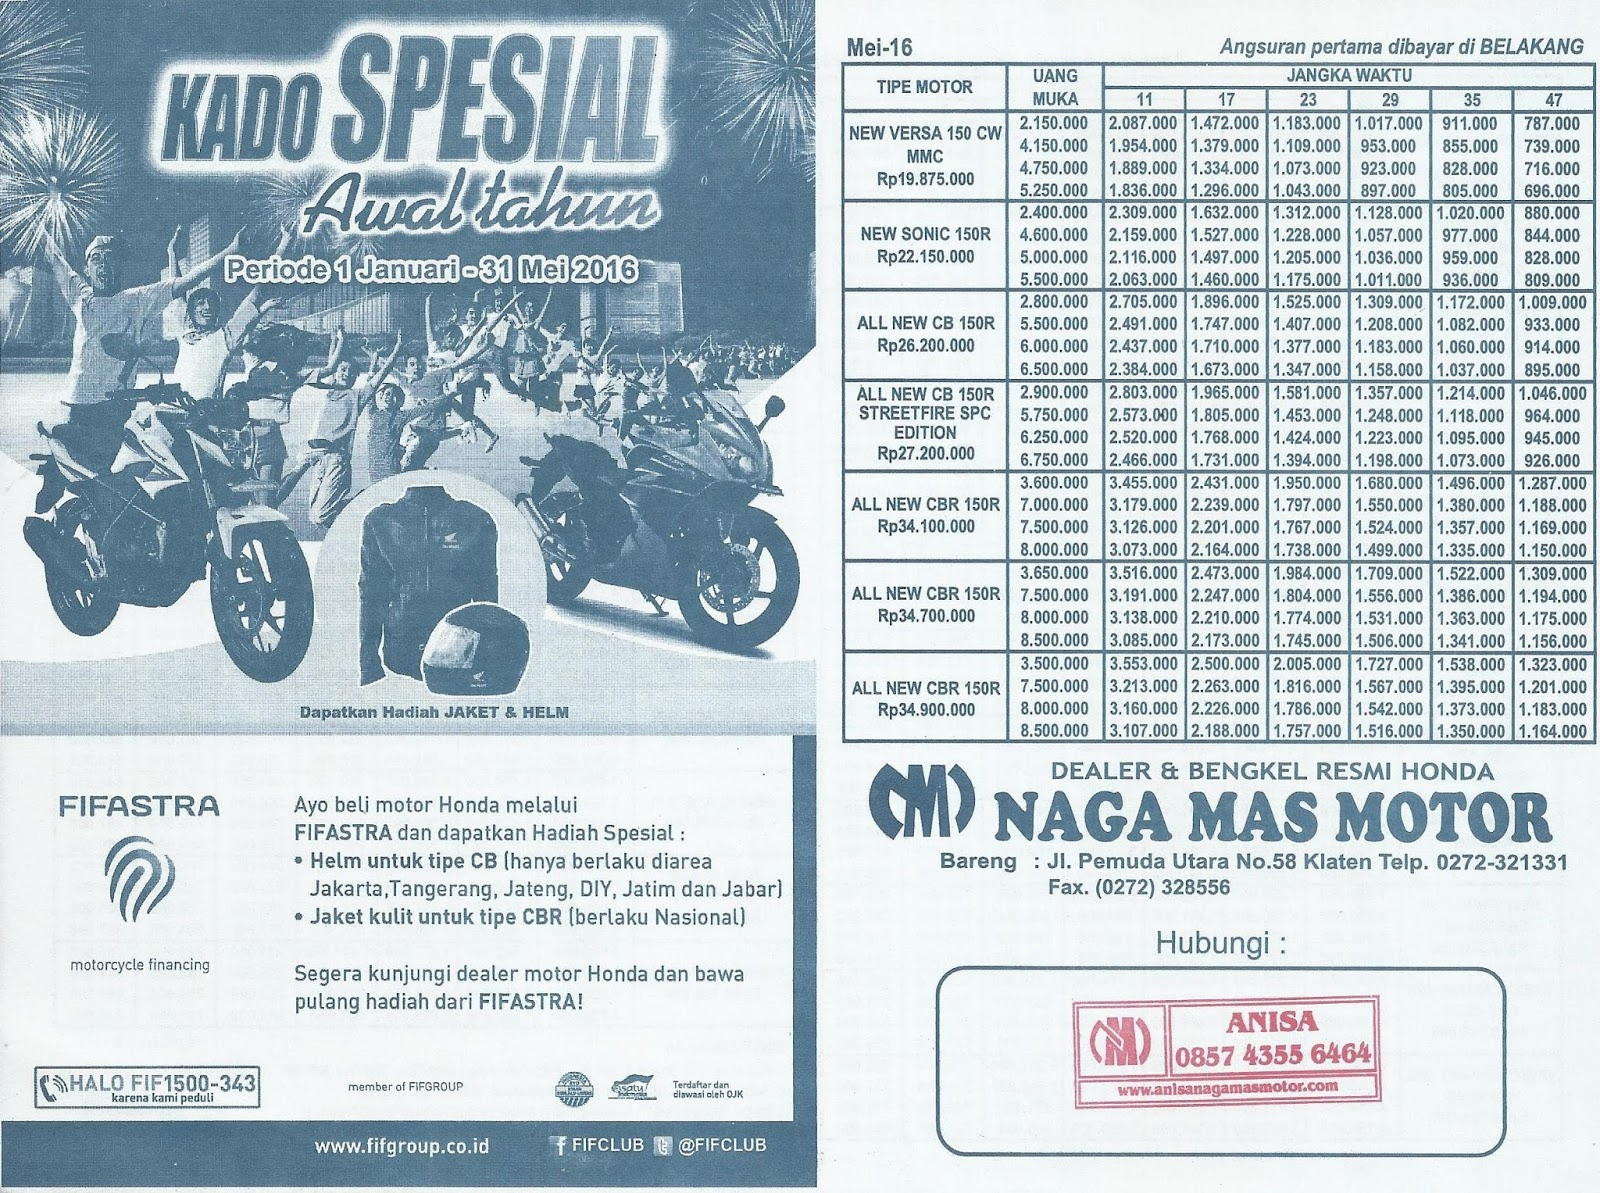 Anisa Counter Sales Dealer Nagamas Motor Klaten All New Beat Sporty Esp Cbs Iss Fusion Magenta Black Salatiga Brosur Kredit Honda Bulan Mei 2016